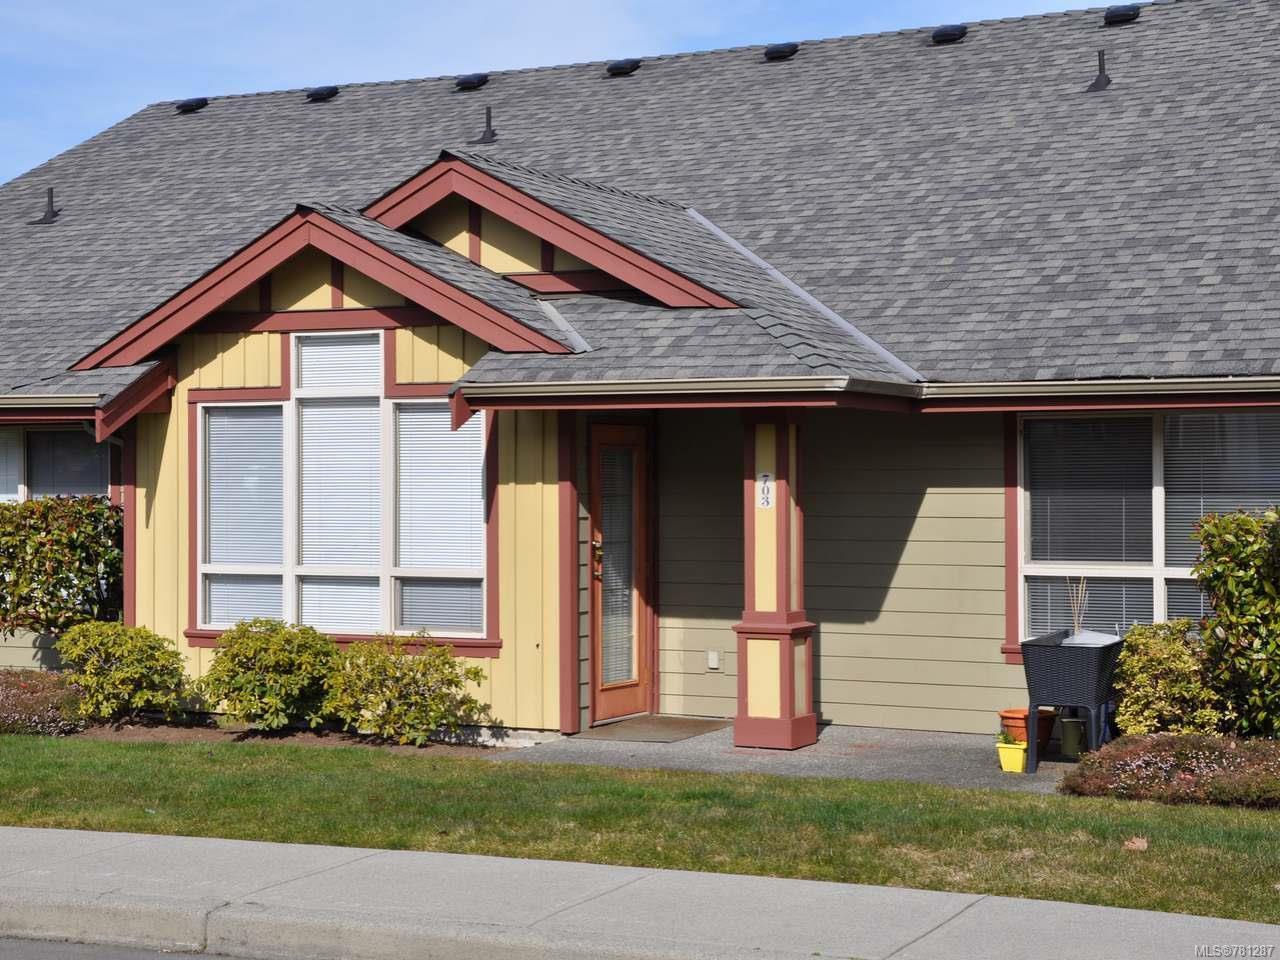 Main Photo: 703 261 MILLS STREET in PARKSVILLE: PQ Parksville Condo for sale (Parksville/Qualicum)  : MLS®# 781287